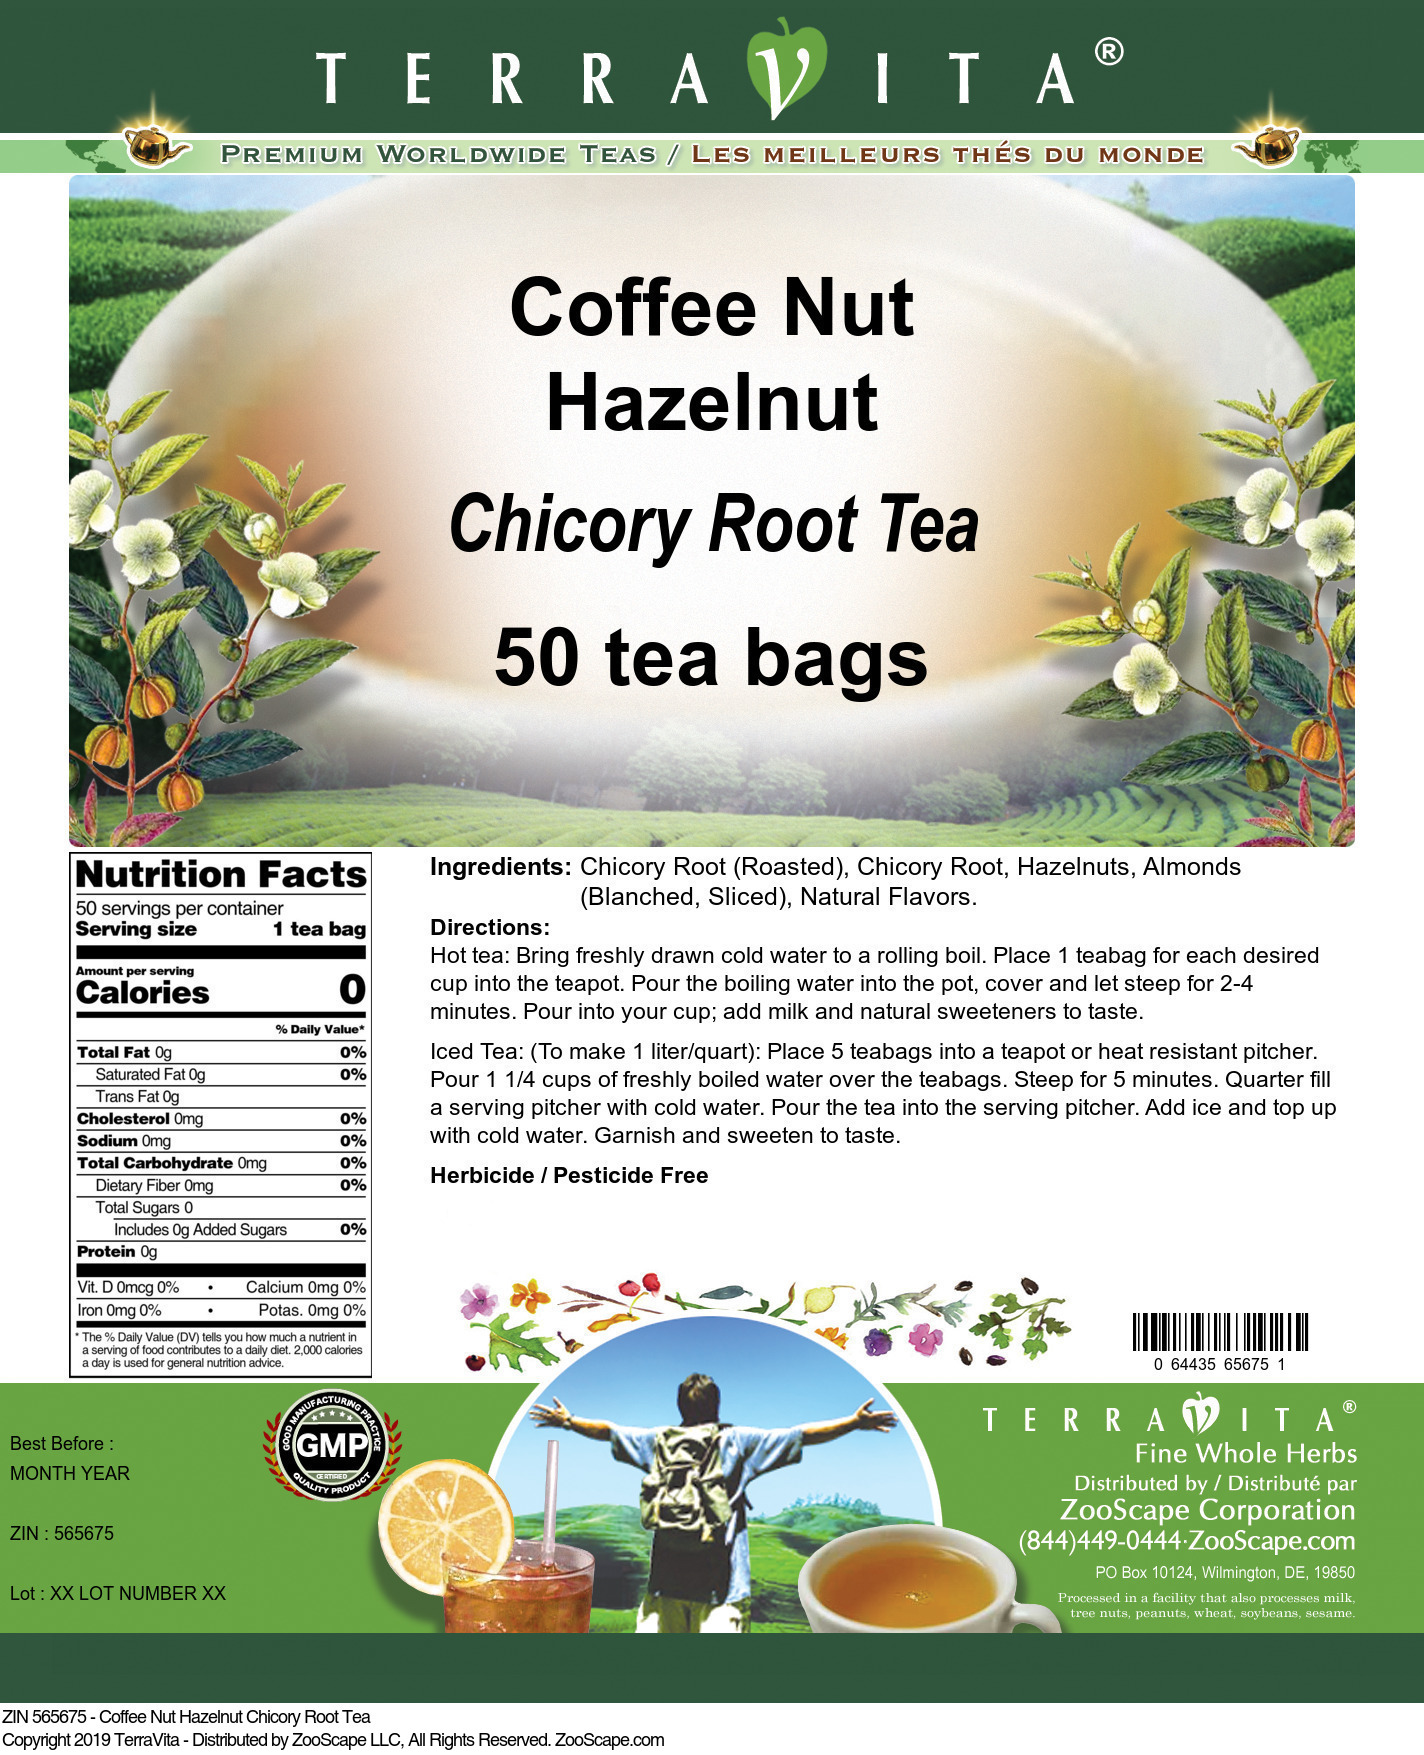 Coffee Nut Hazelnut Chicory Root Tea